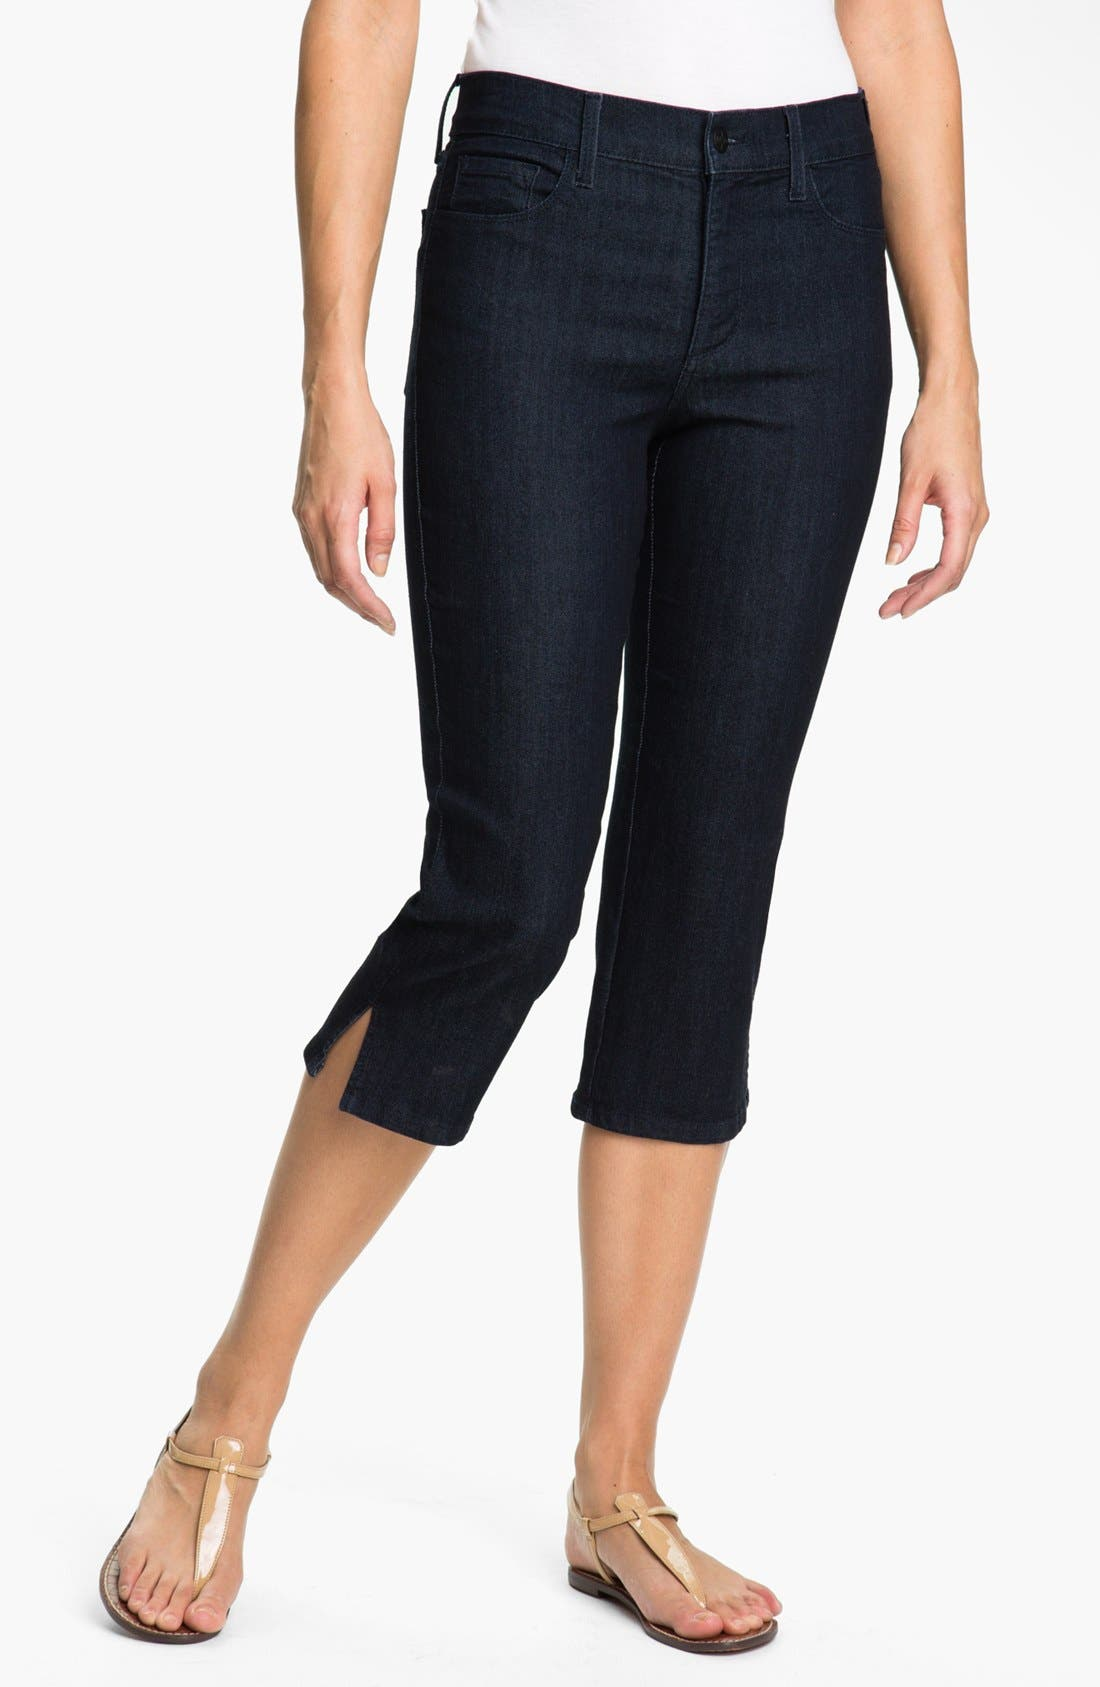 Main Image - NYDJ 'Nanette' Stretch Crop Jeans (Dark Enzyme) (Petite)